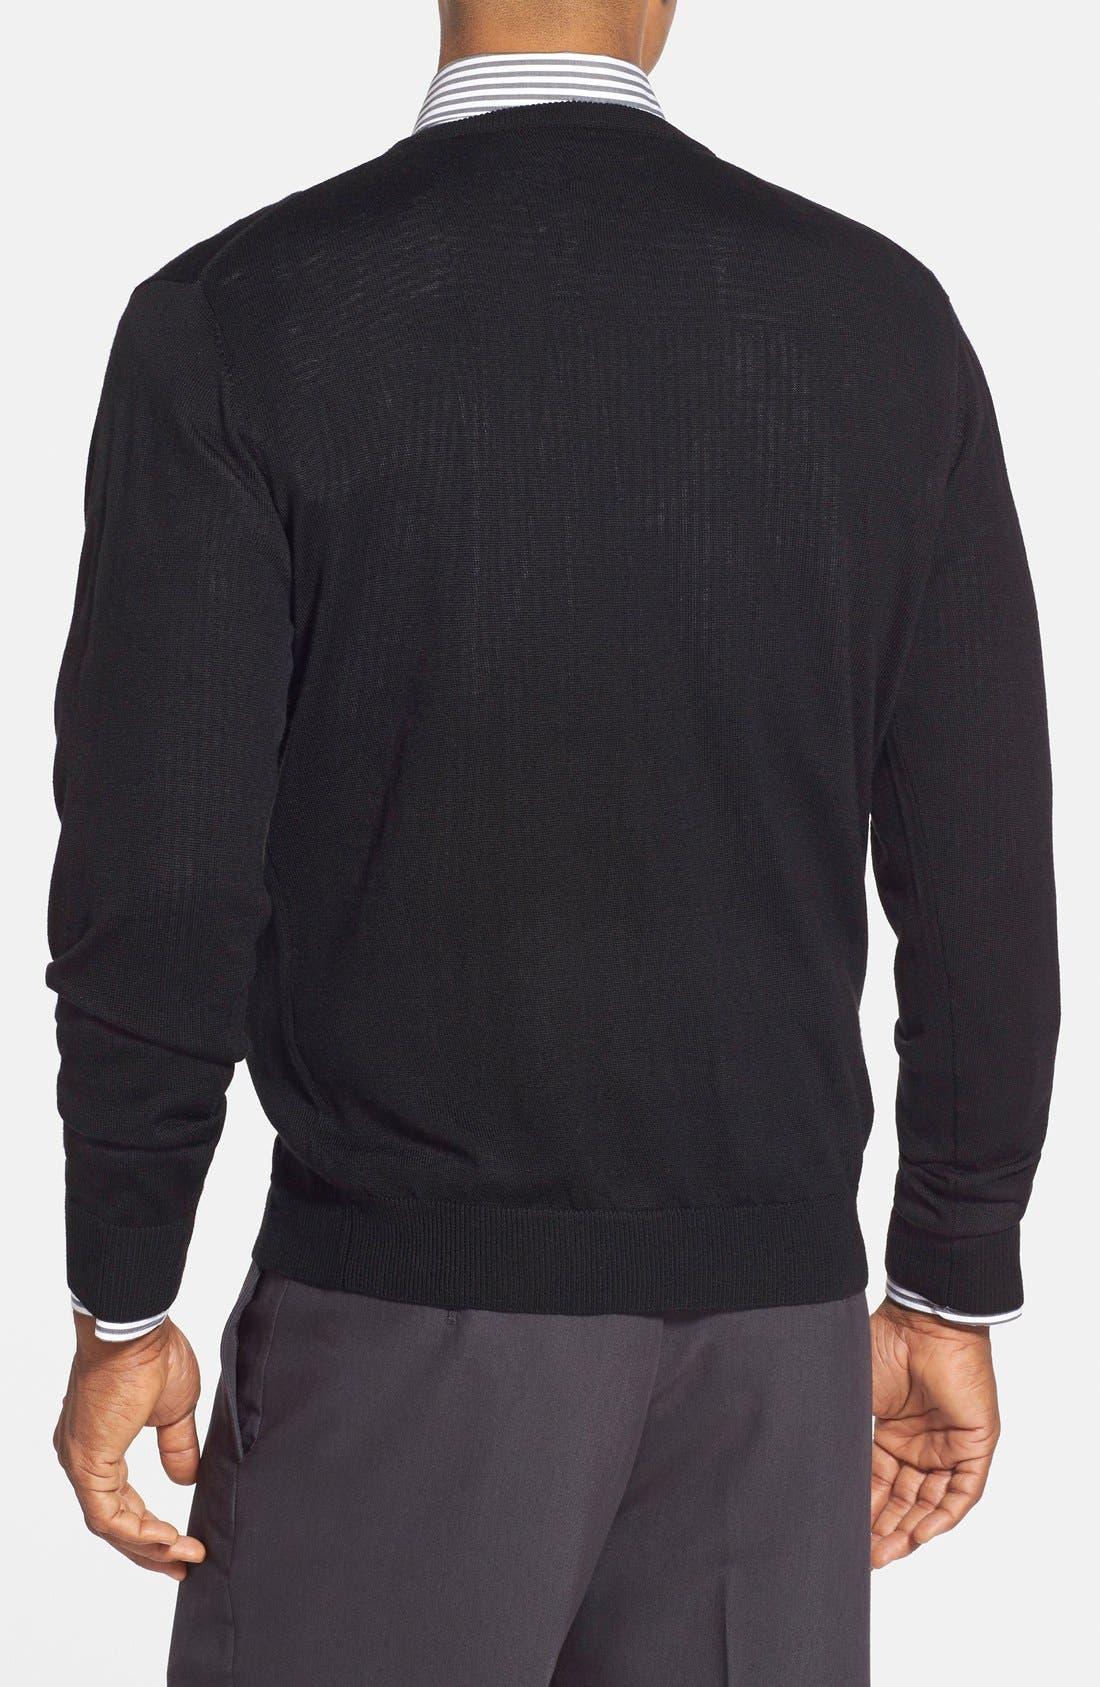 Alternate Image 3  - Cutter & Buck 'Douglas' Merino Wool Blend V-Neck Sweater (Online Only)